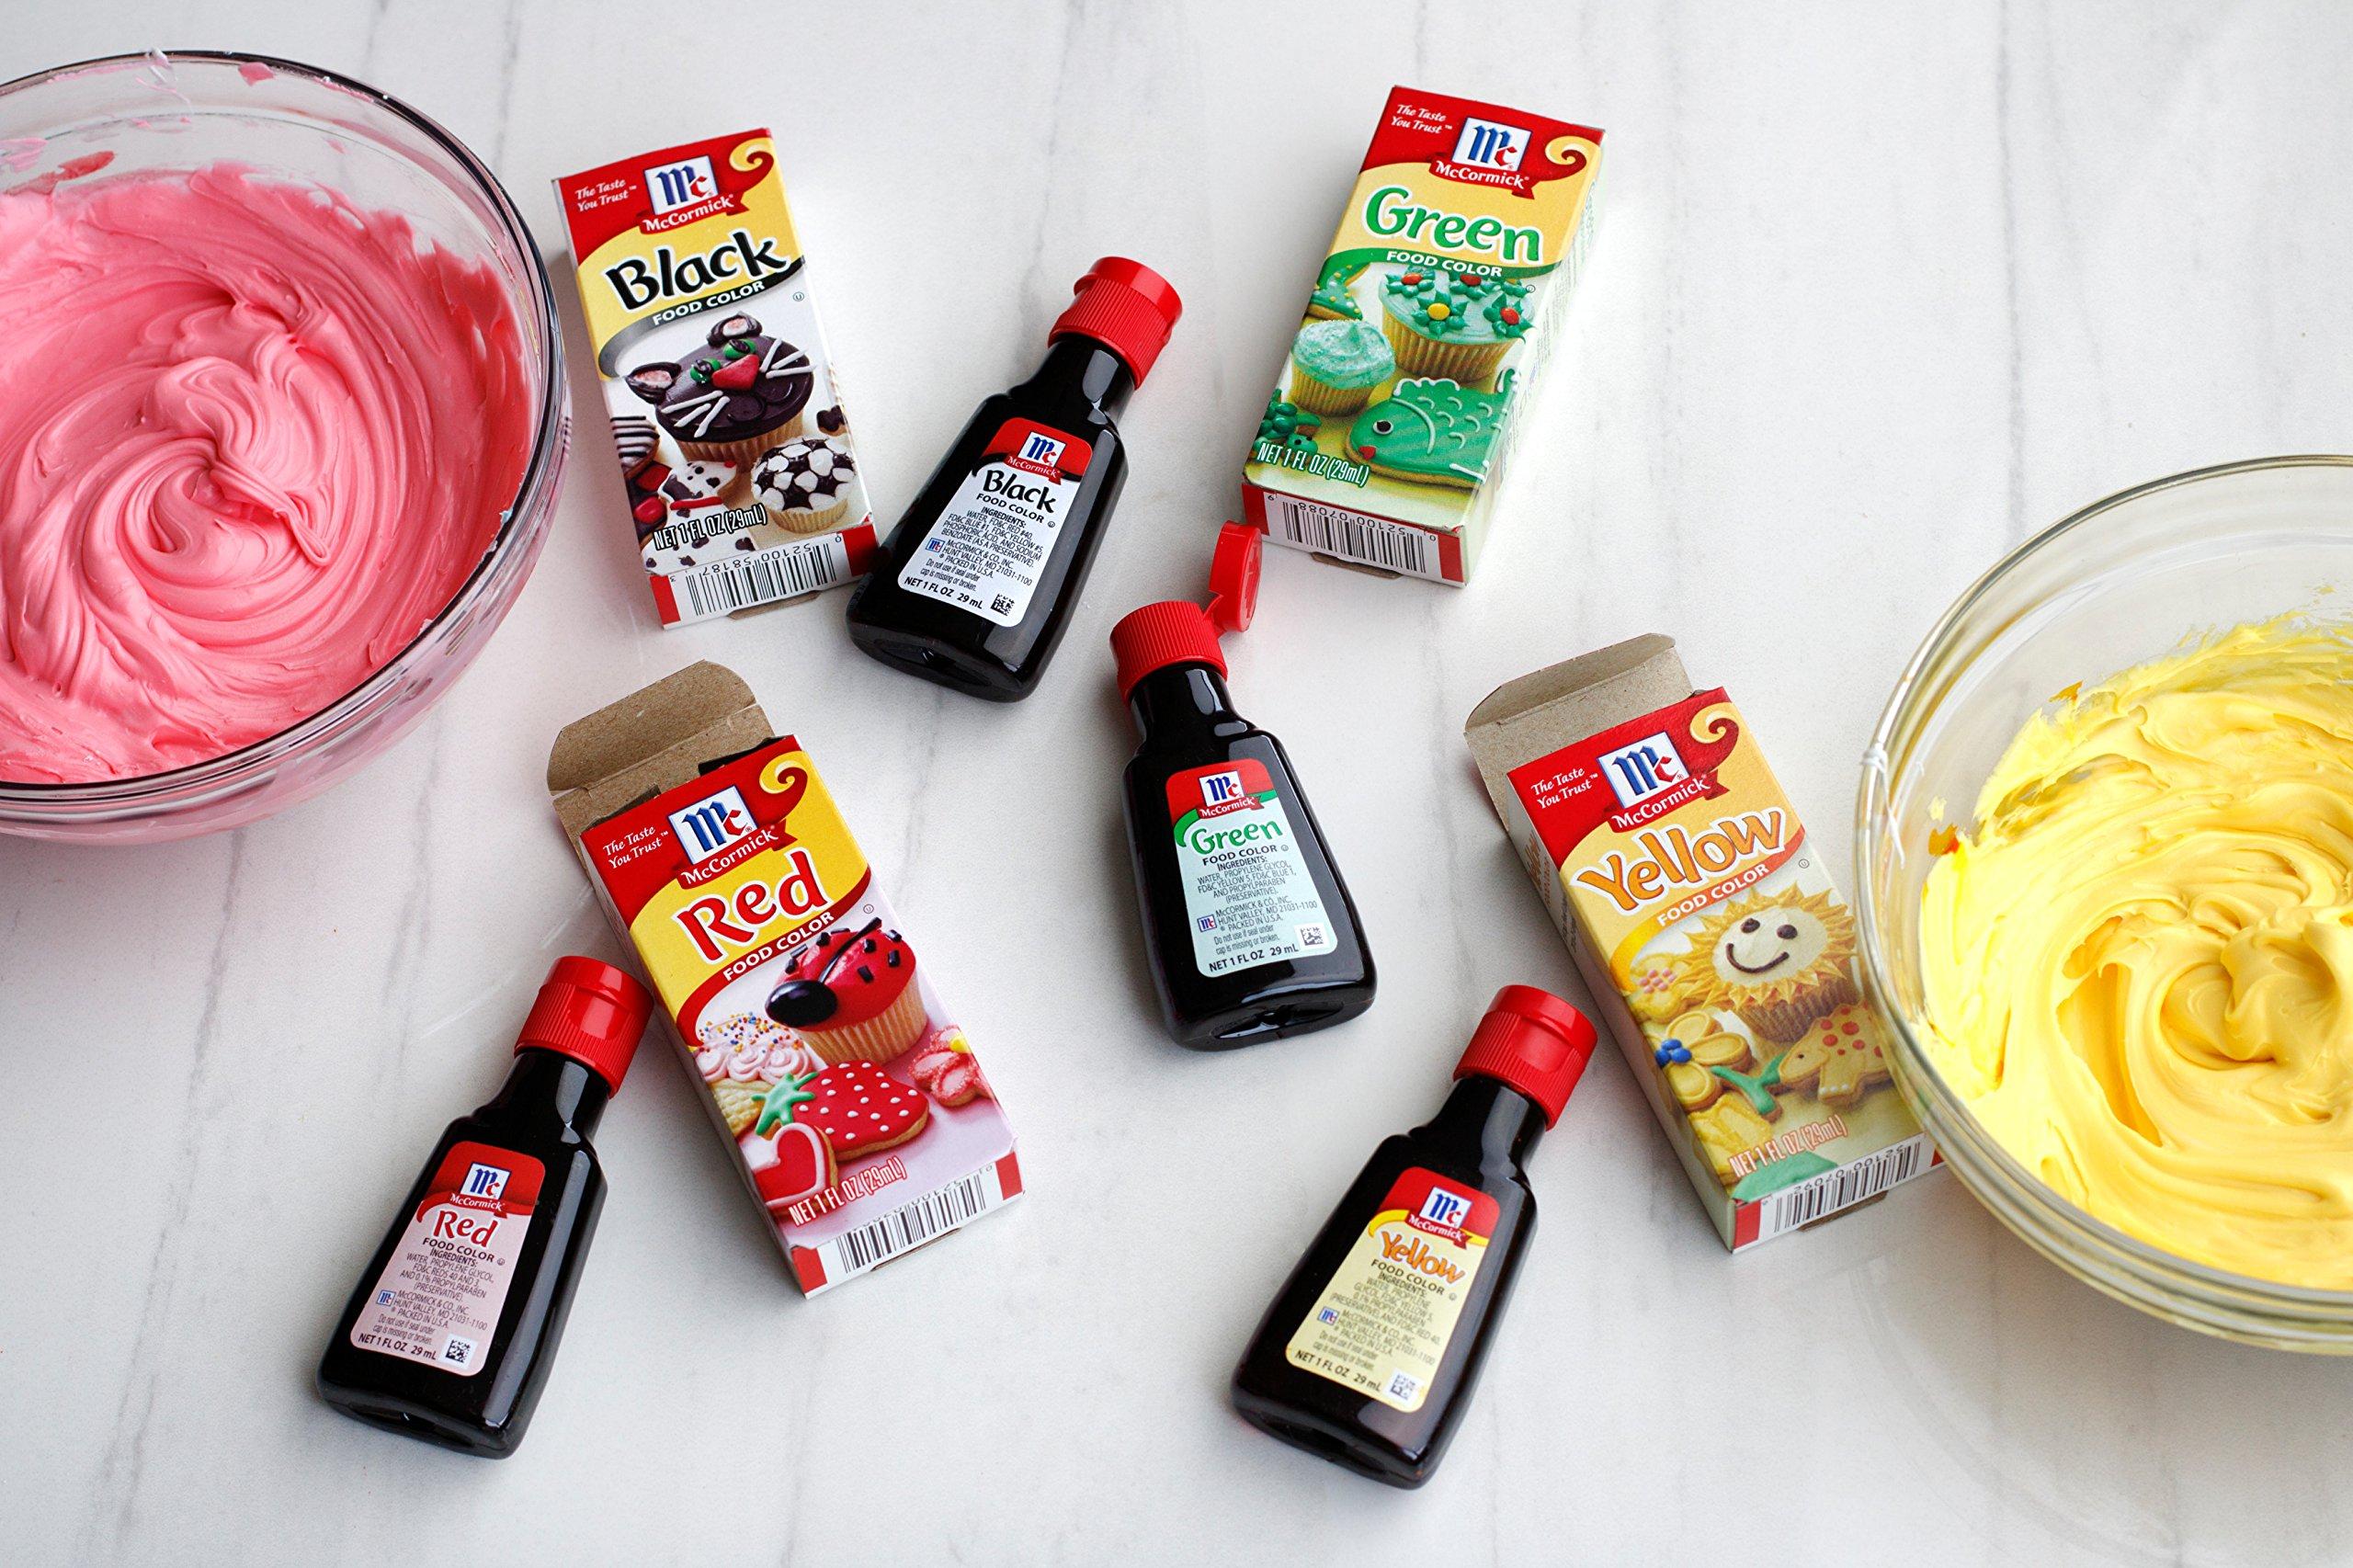 McCormick Red Food Color, 0.25 Fl. Oz (4 Count) - Buy Online ...